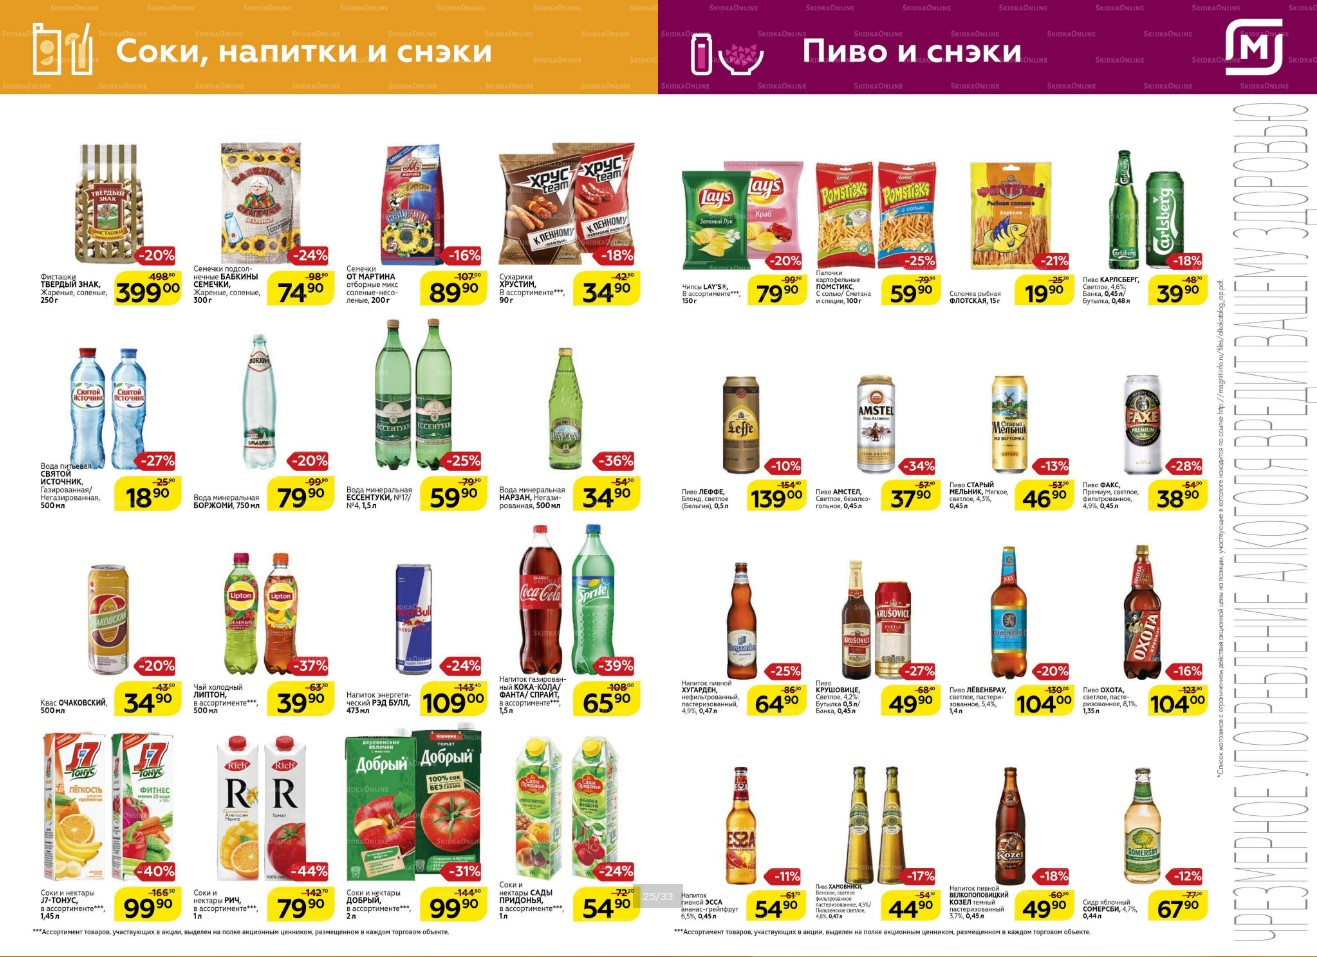 Каталог гипермаркет МАГНИТ 08.05.-21.05.2019 стр.13